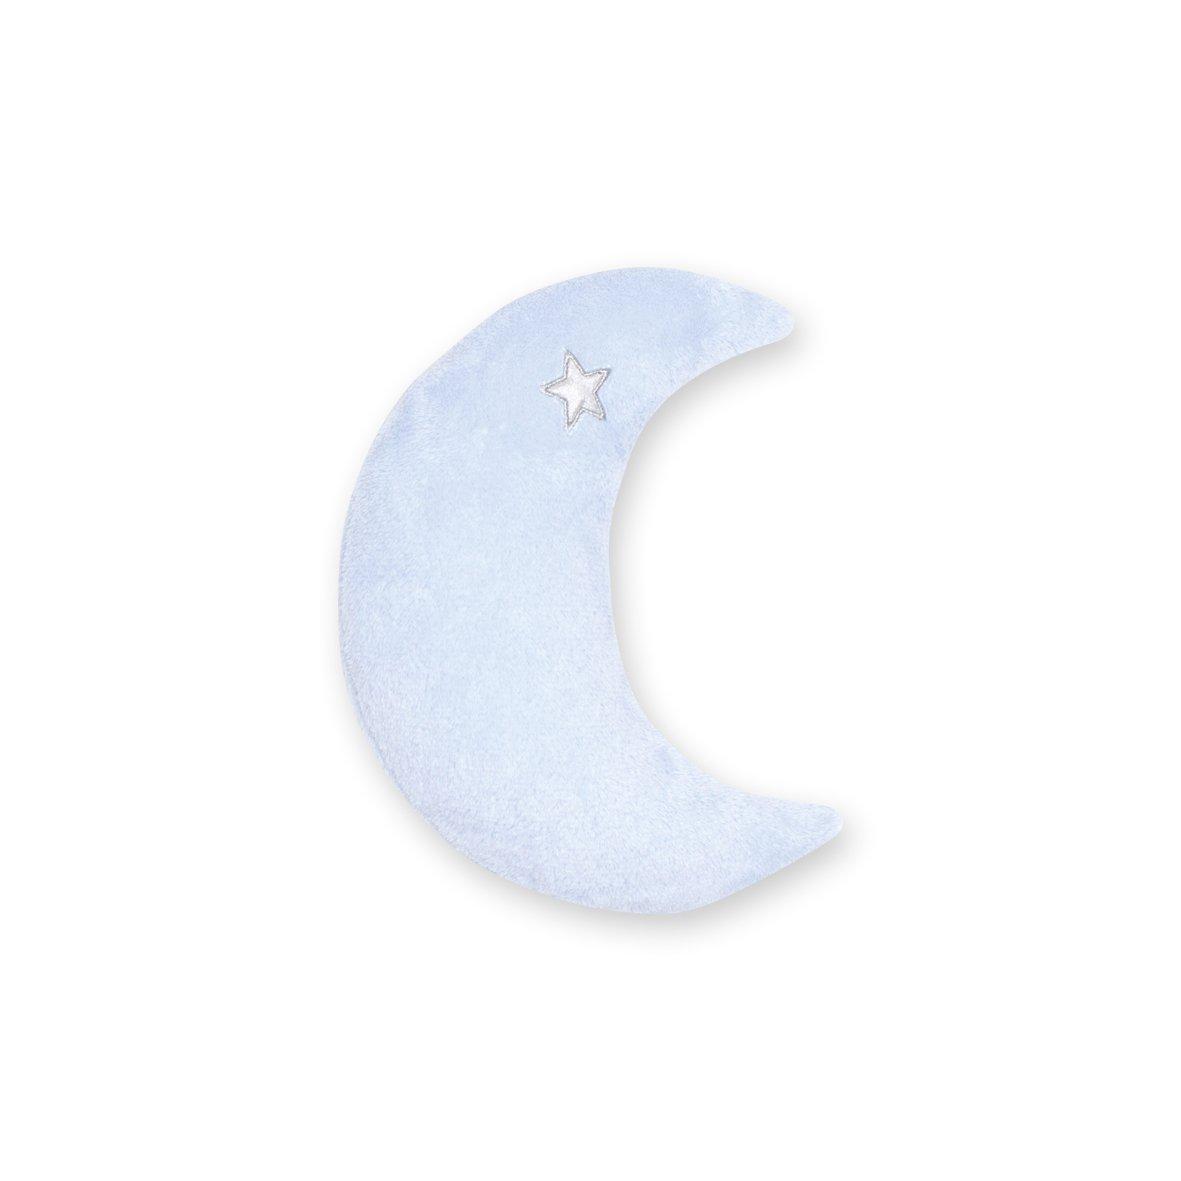 Bemini Softy Cushion, Moon Honey Morning 60 BABY BOUM UK 554HONEY60SF